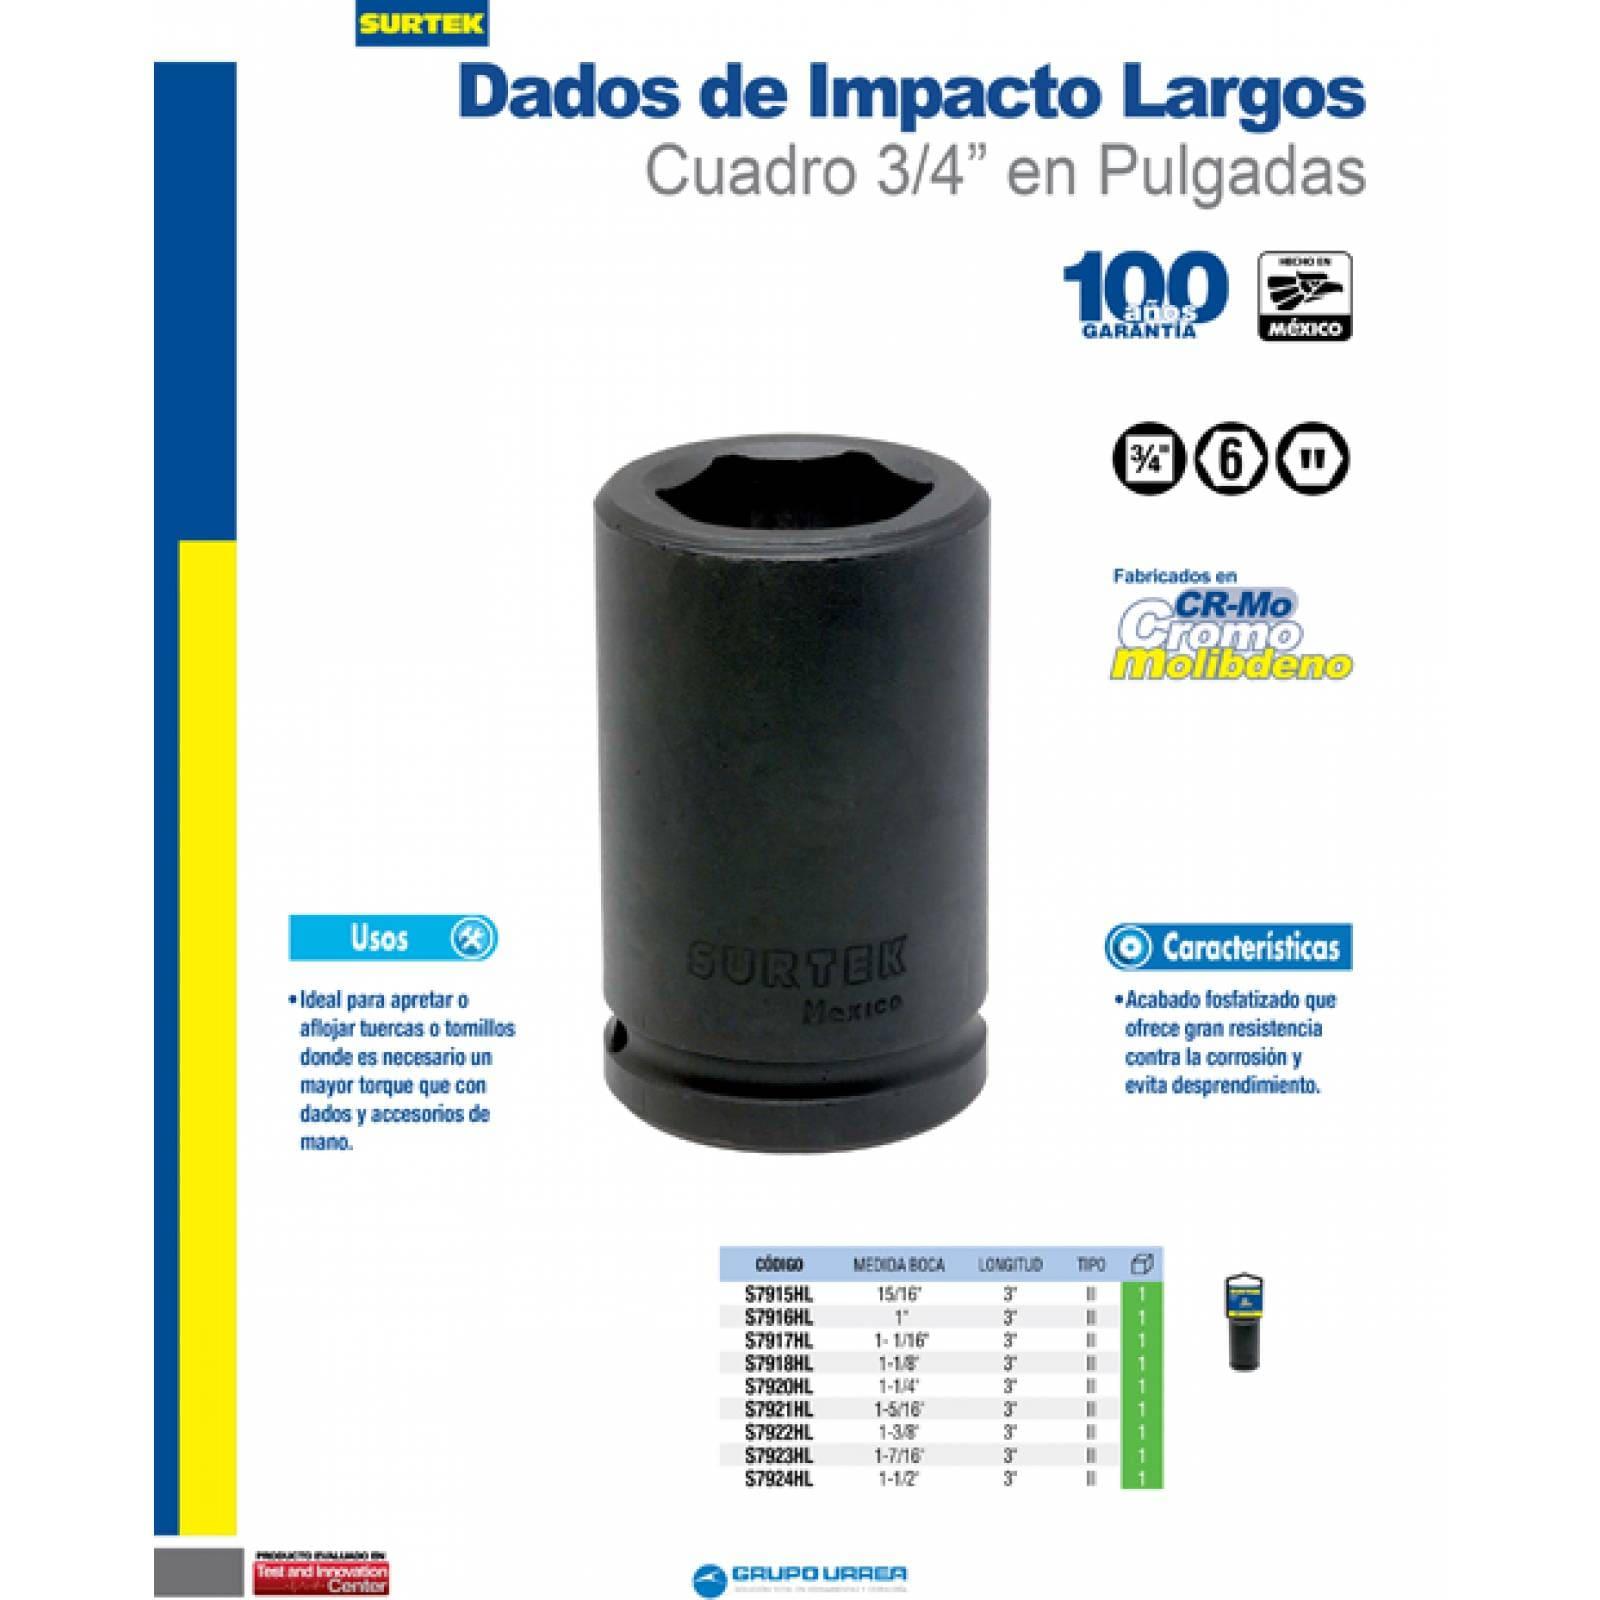 "Dado De Impacto 3/4"" Largo 6 Puntos 1-5/16 S7921HL Surtek"